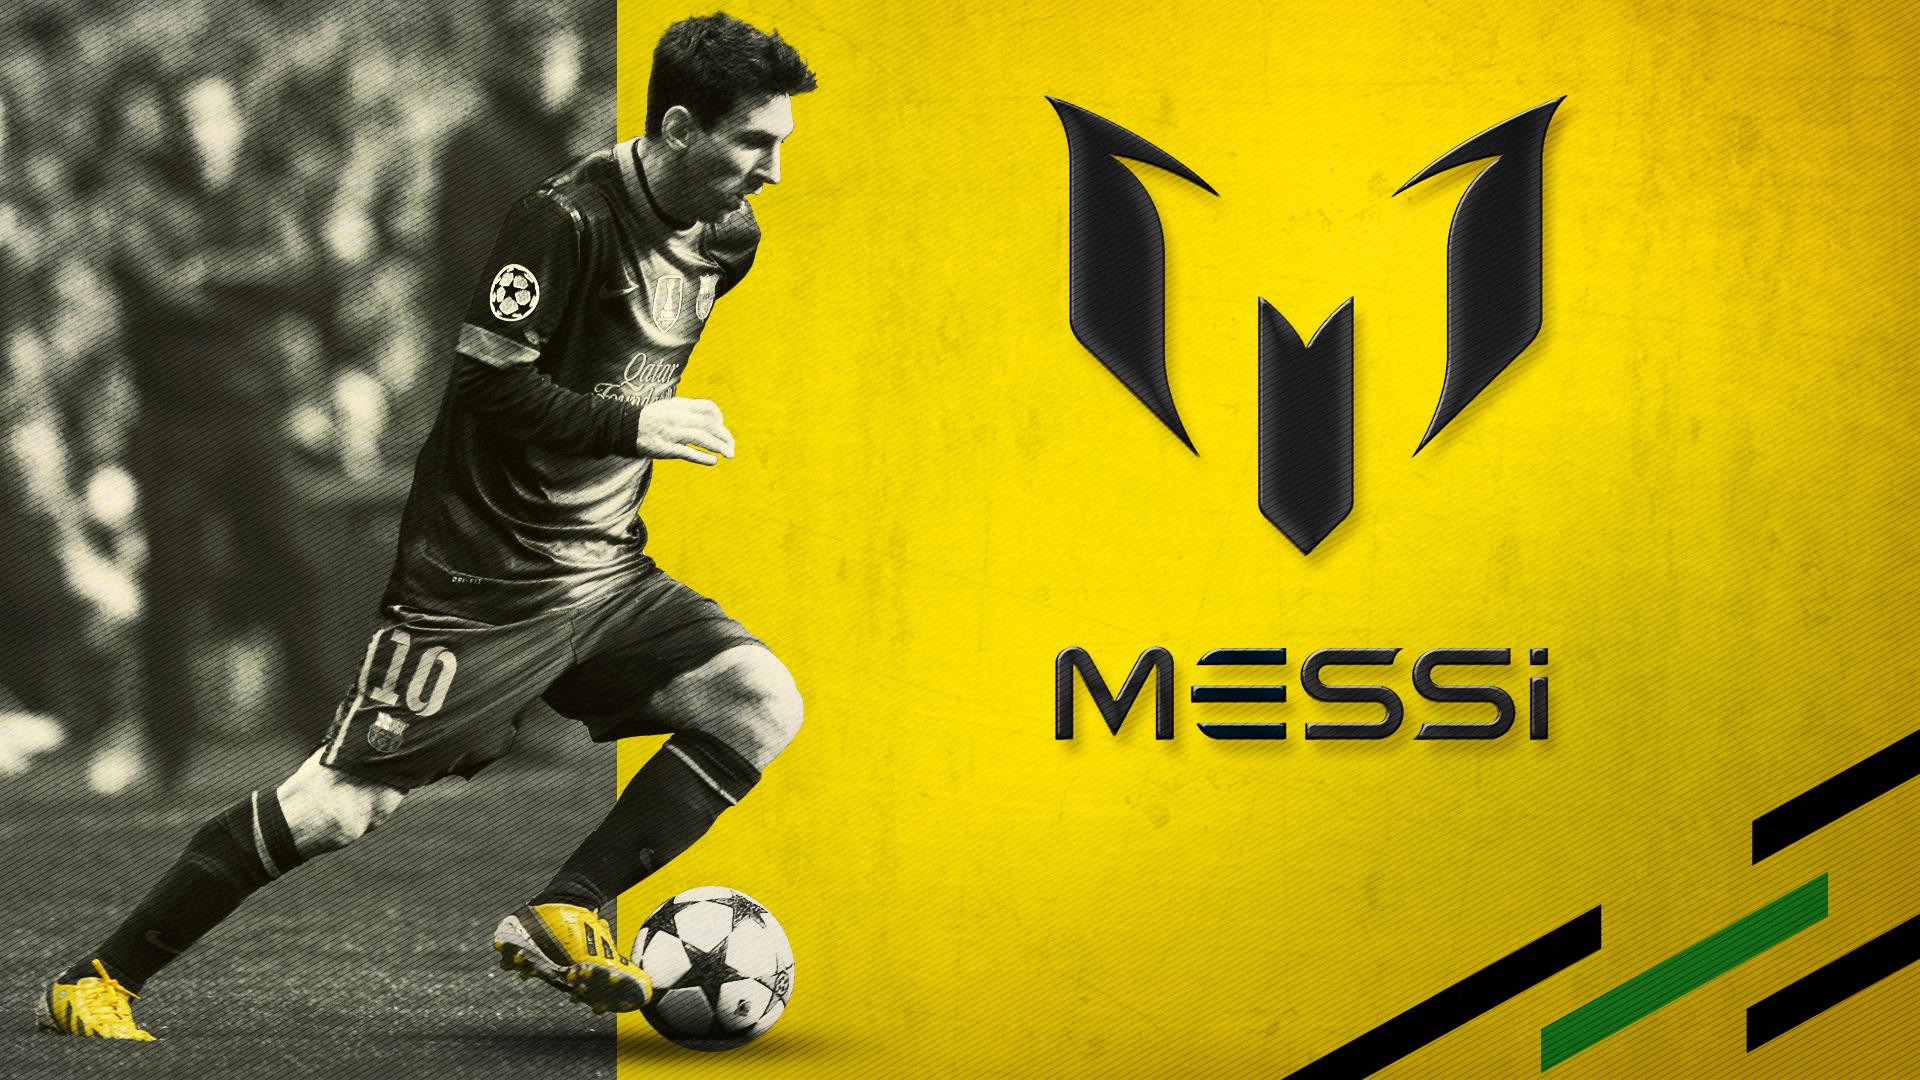 Top Wallpaper Logo Messi - Messi-Wallpaper-9  Photograph_711797.jpg